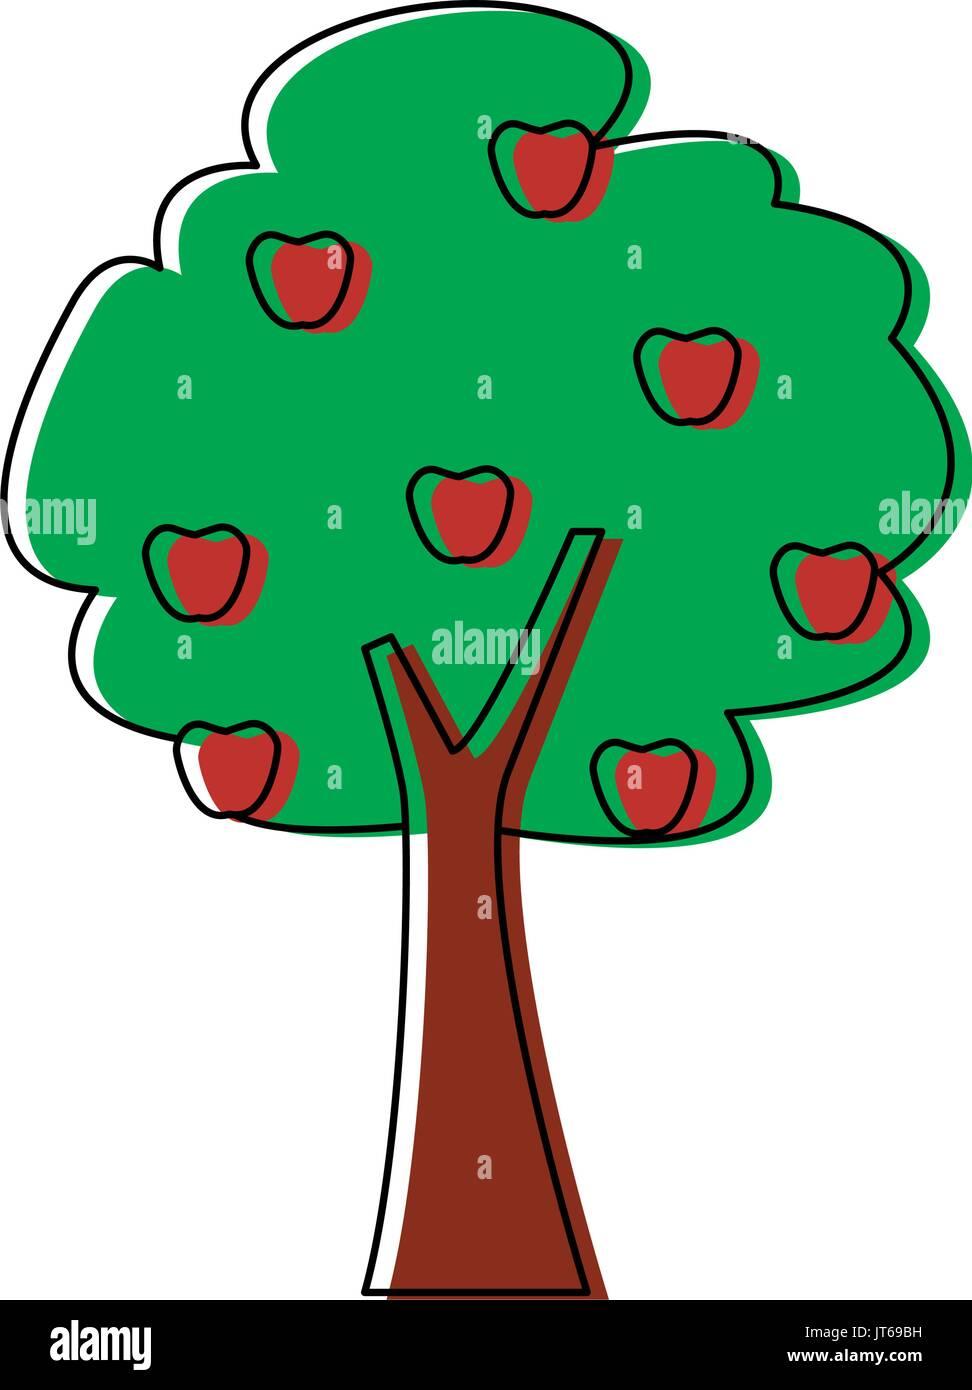 tree fruit botanical nature forest ecology - Stock Vector